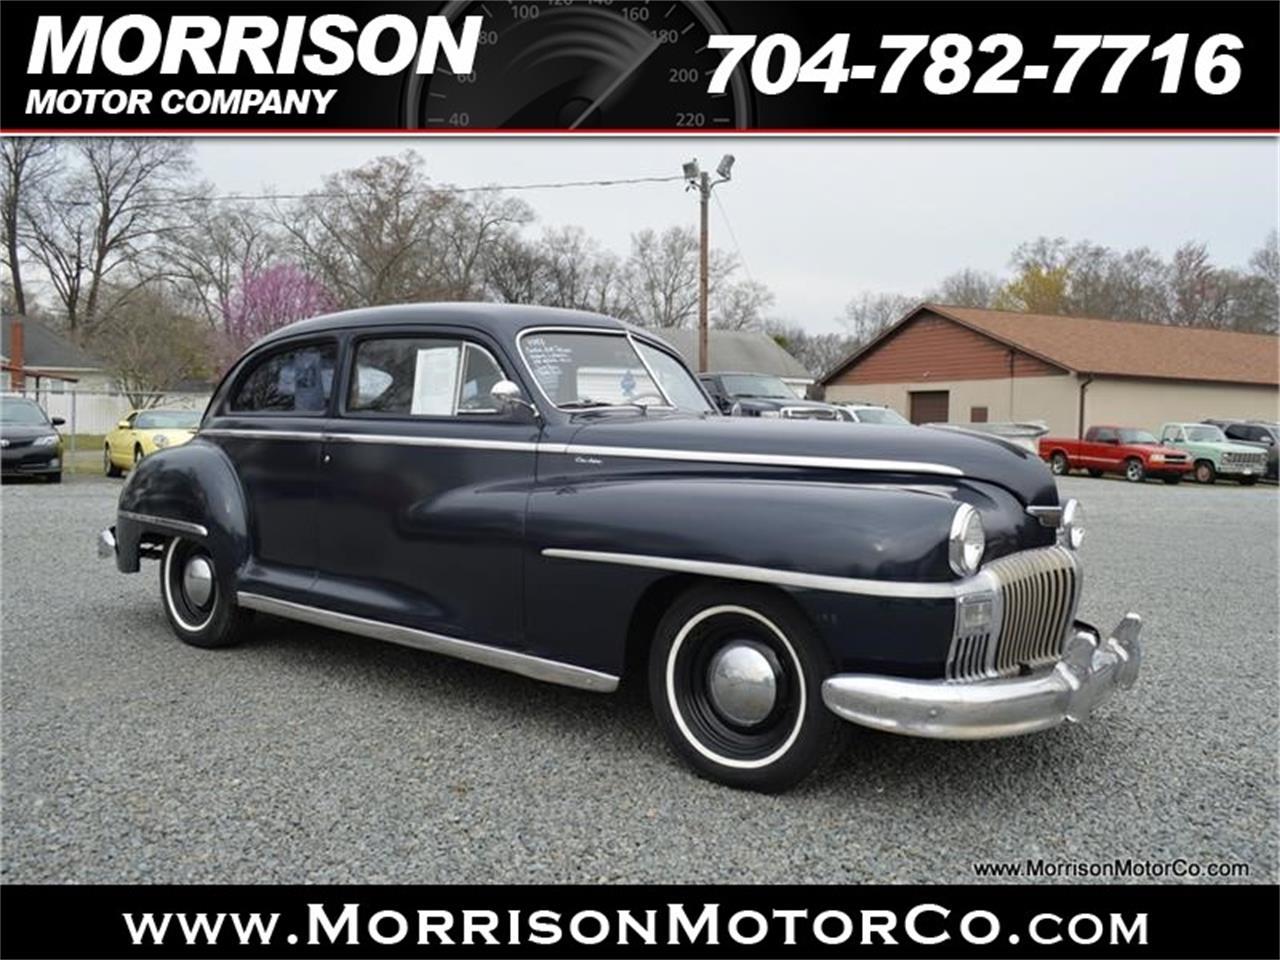 New Bmw Concord Nc >> Morrison Motor - impremedia.net